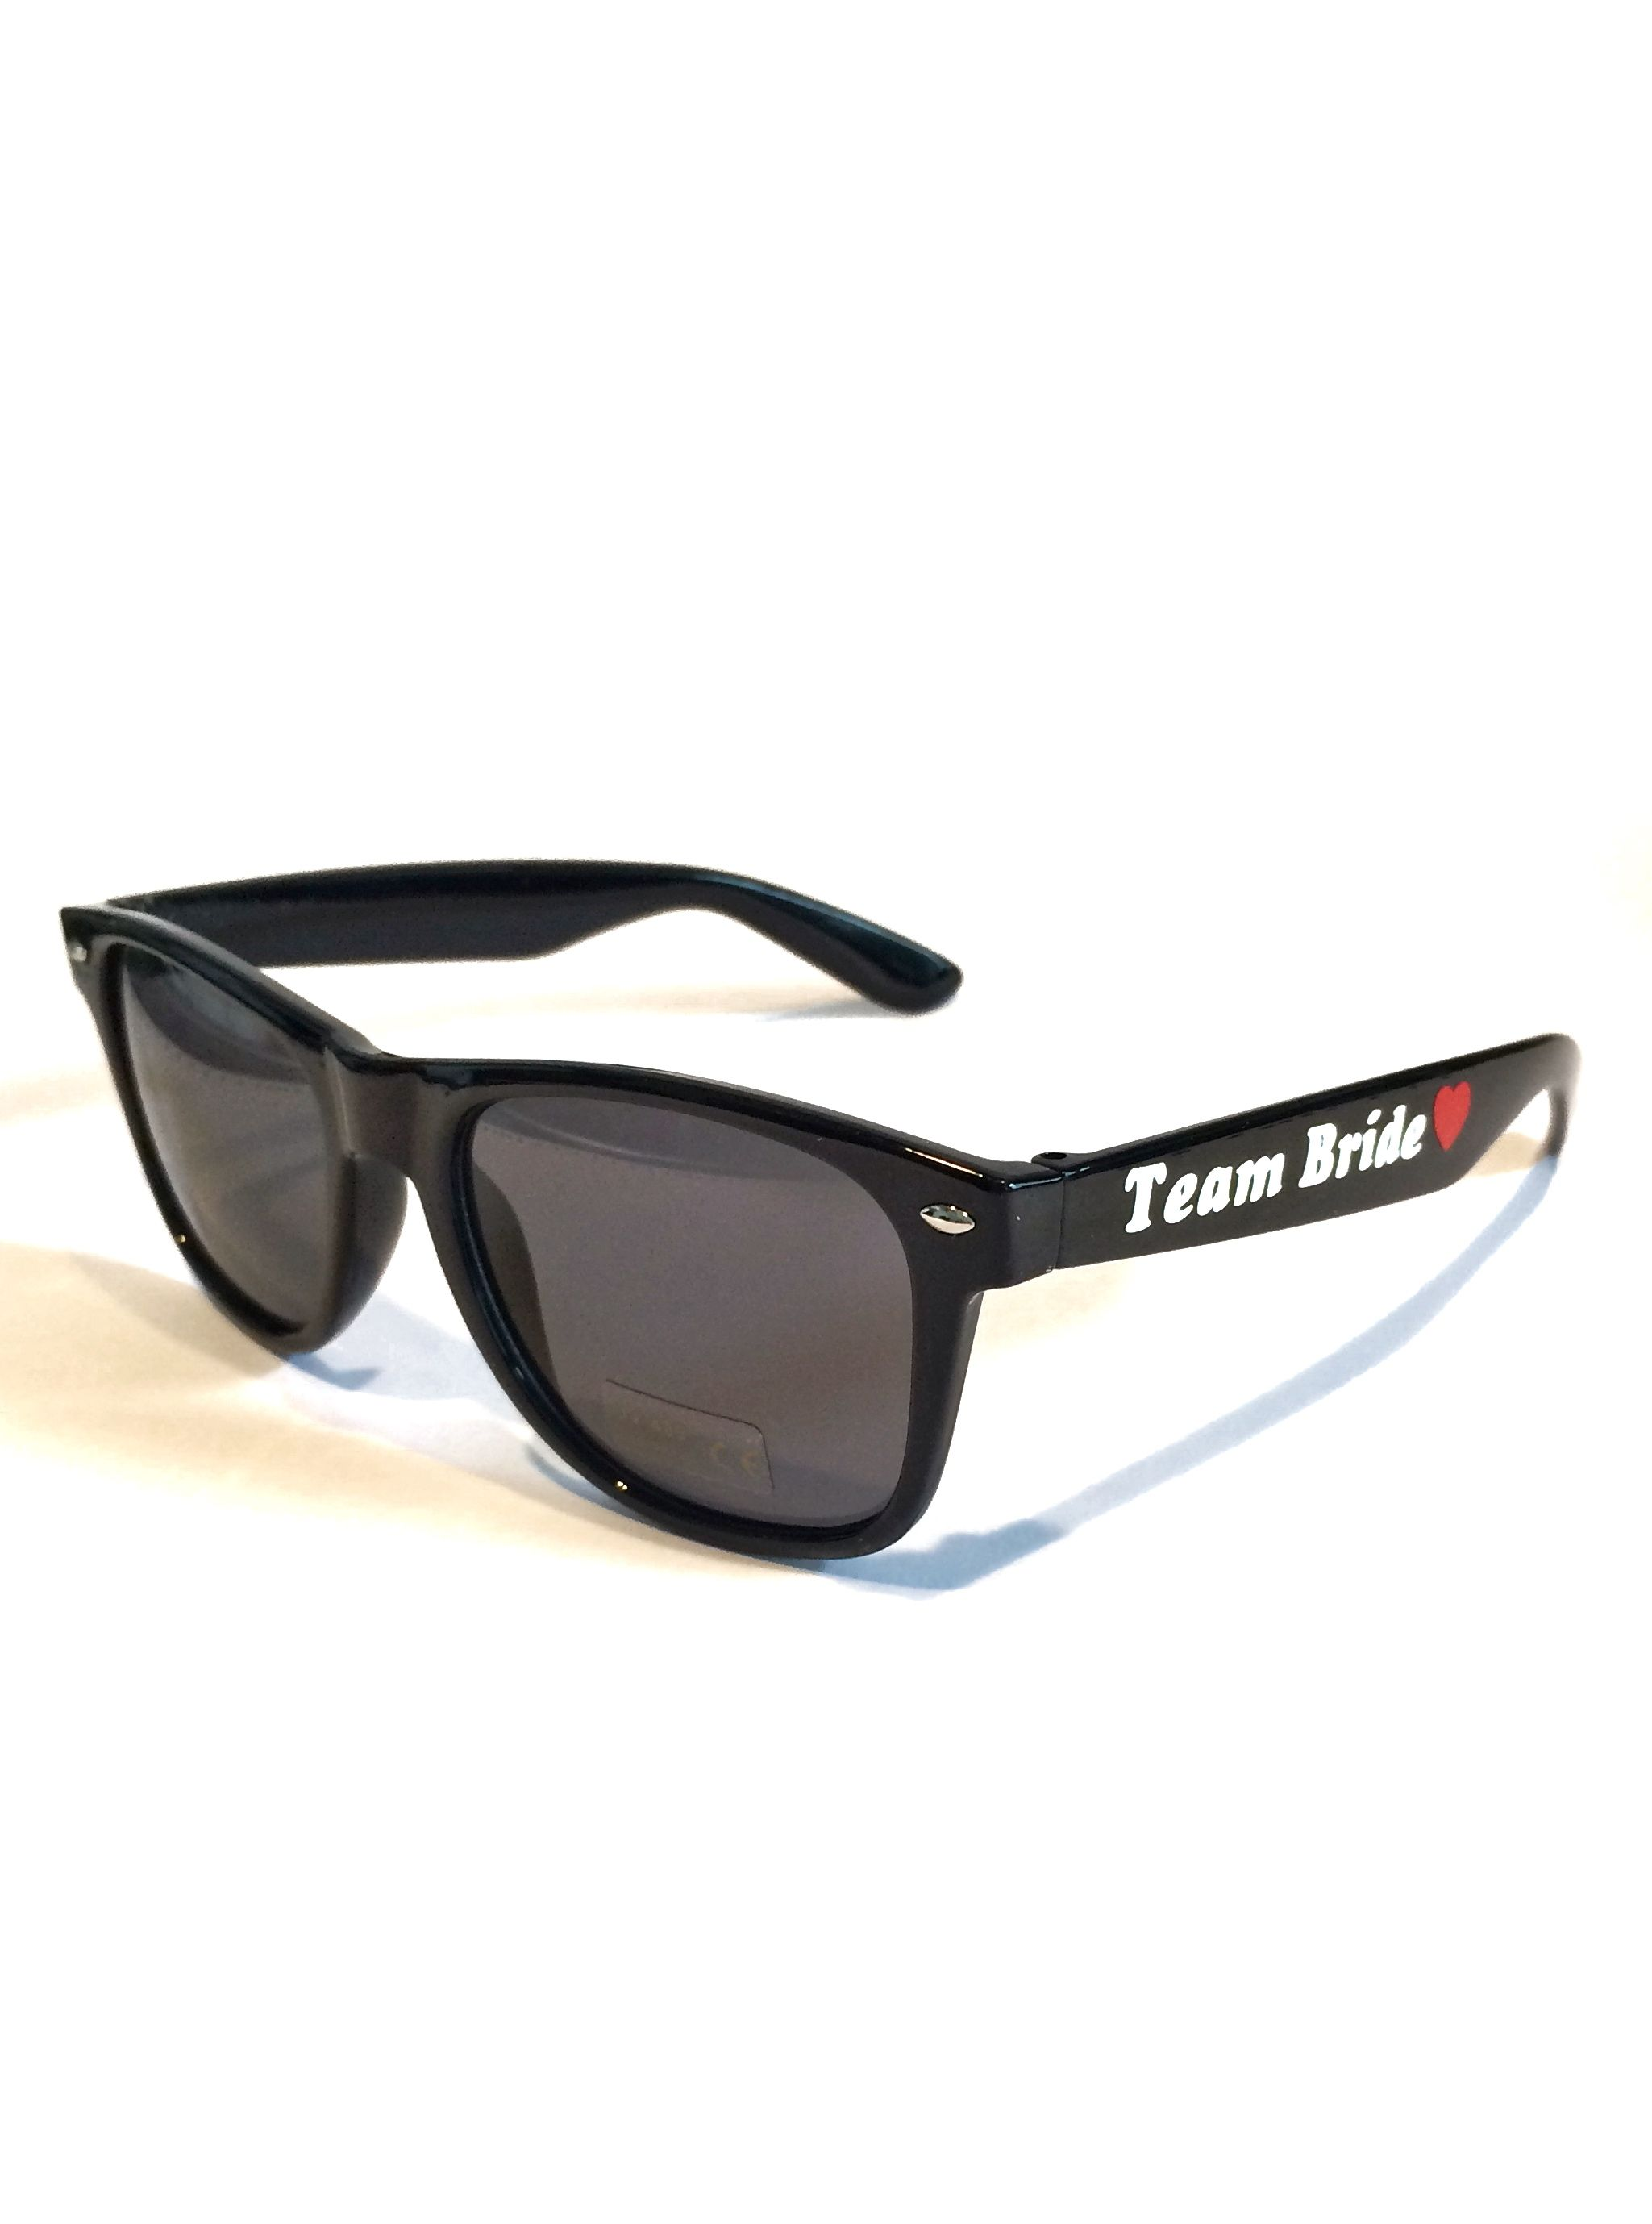 custom sunglasses, bachelor party sunglasses, personalized ...